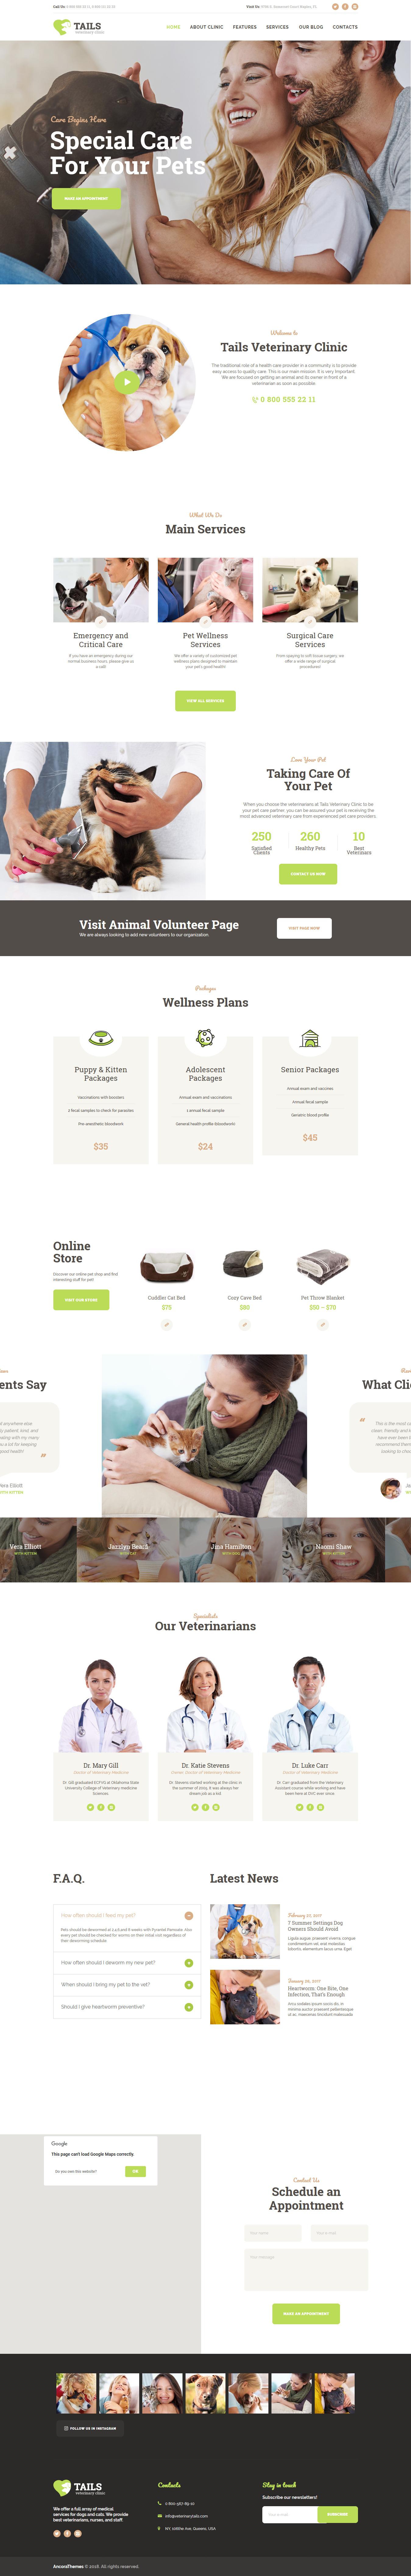 tails best premium animal and pet wordpress theme - 10+ Best Premium Animal and Pet WordPress Themes